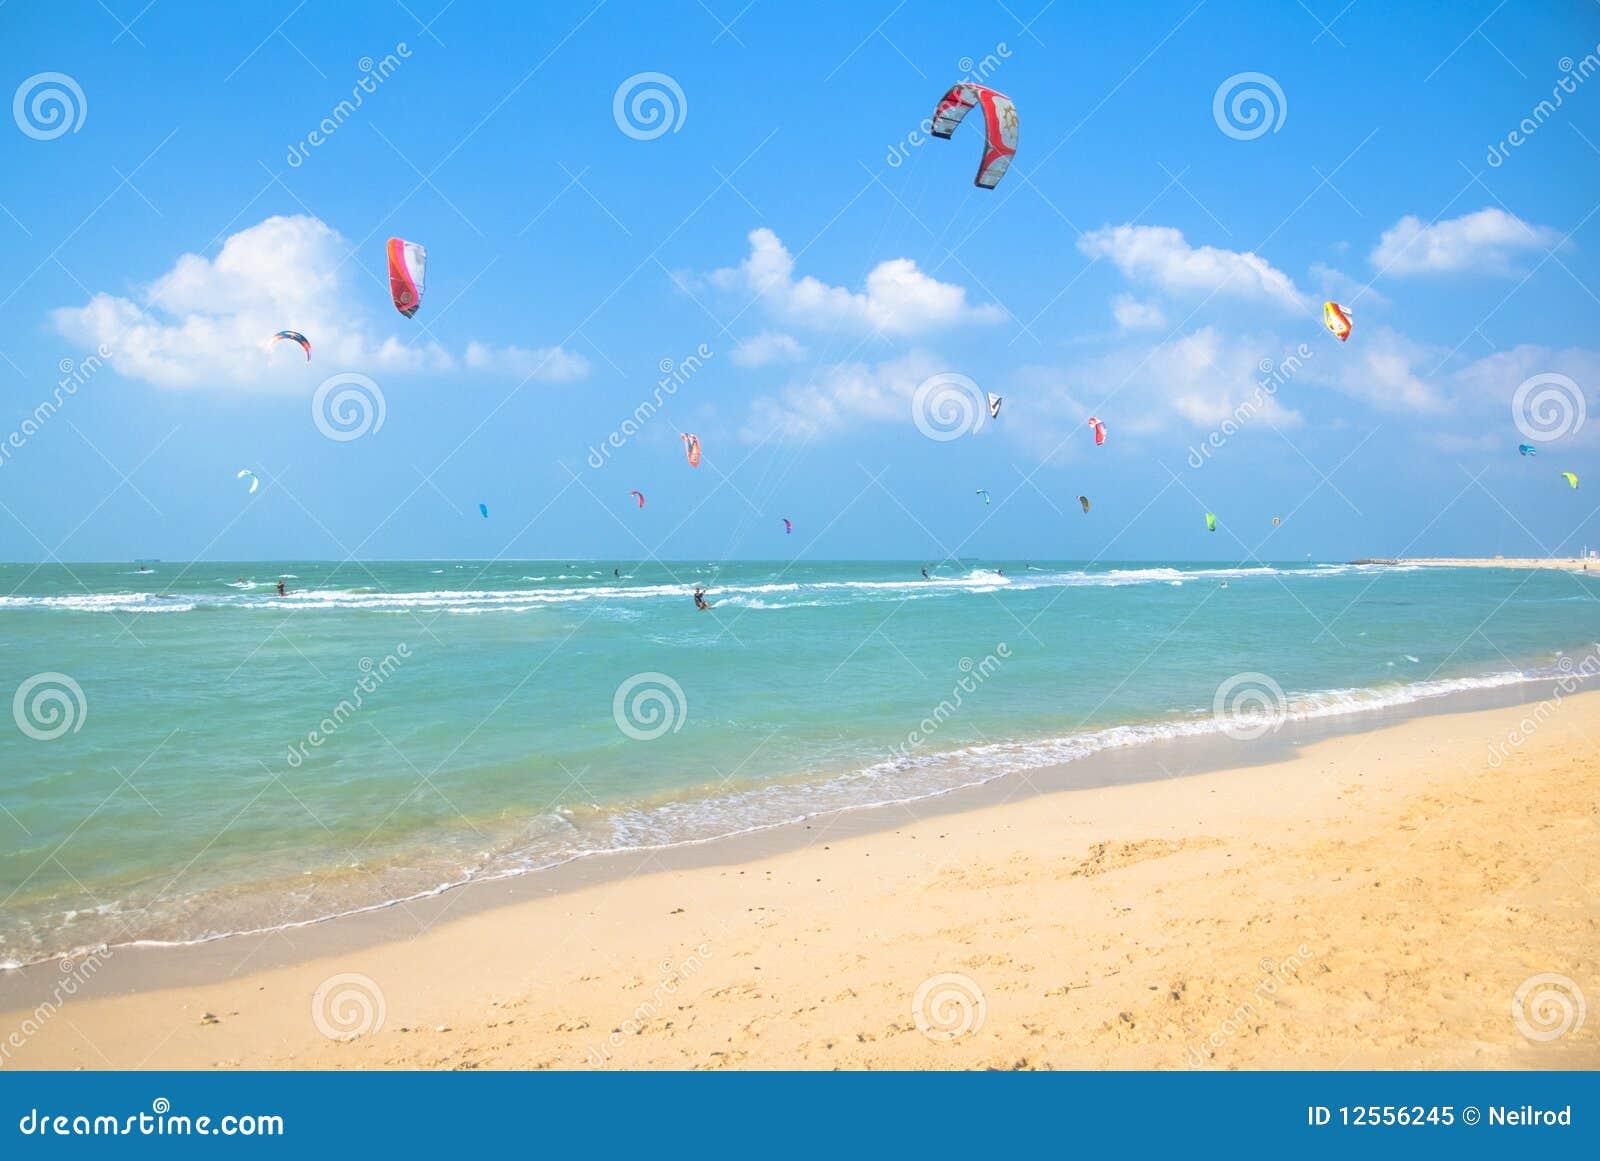 Kania surfing